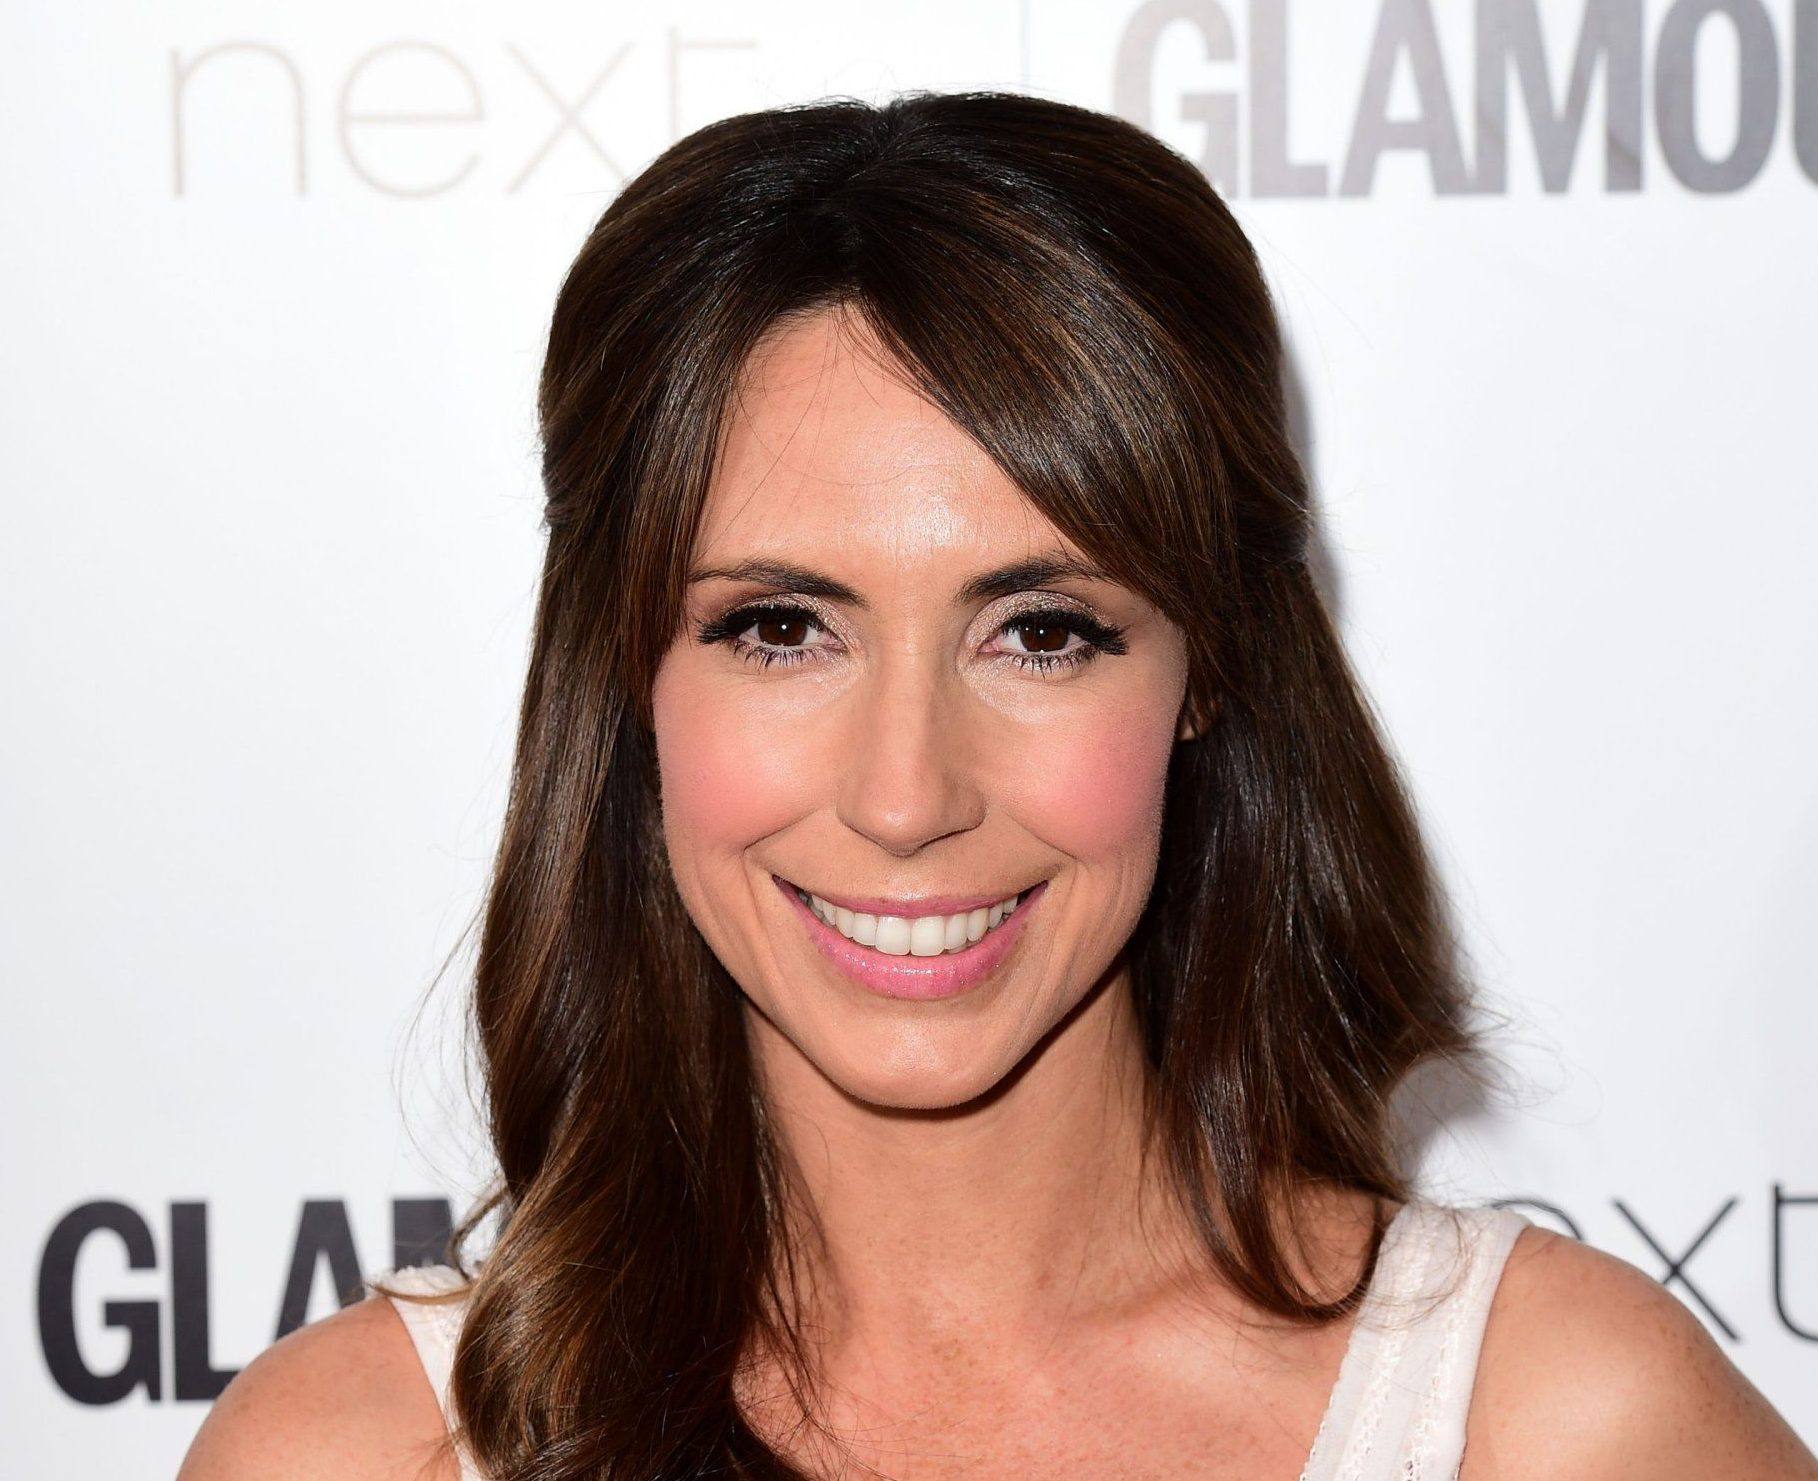 Alex Jones shocked to learn she earns £50,000 less than One Show co-host Matt Baker